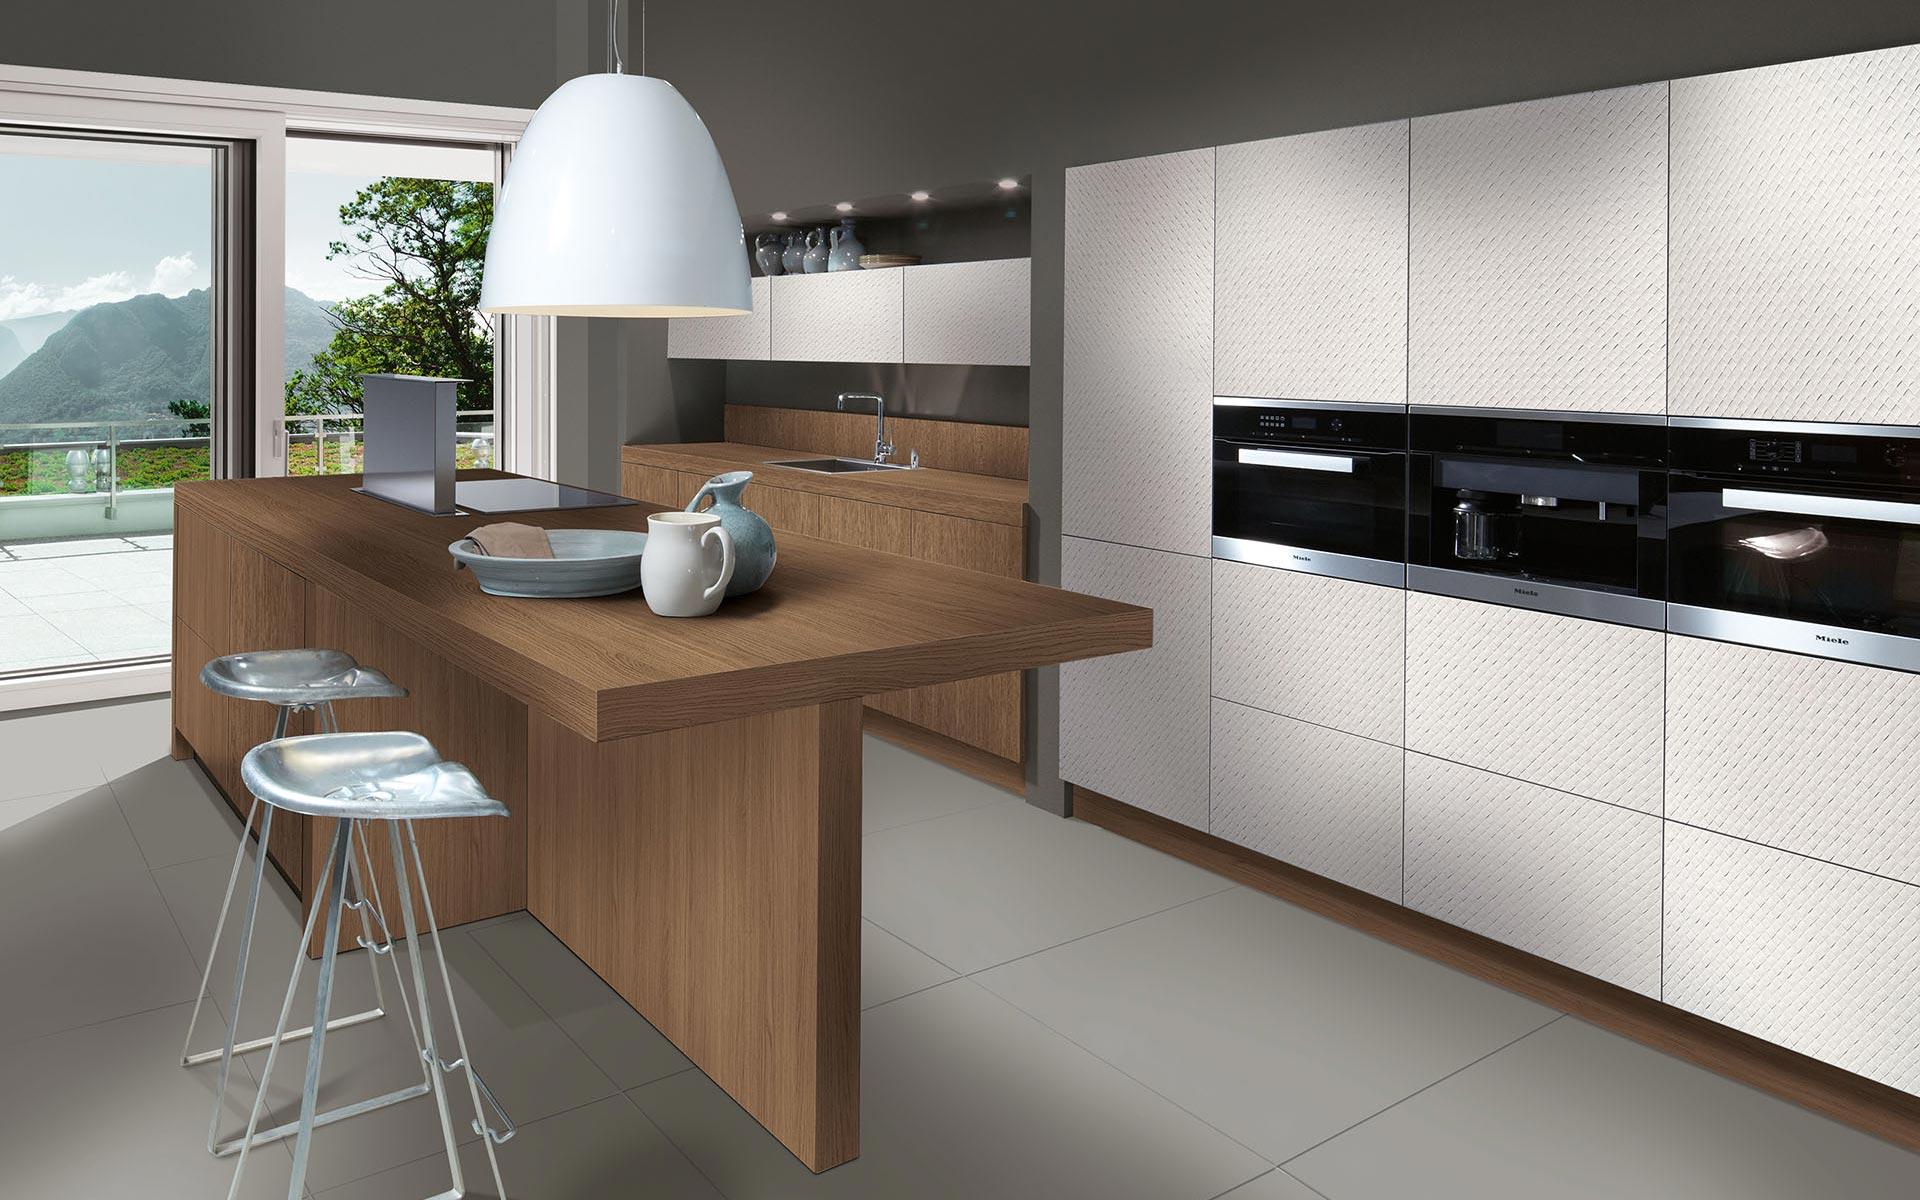 Toronto: Kitchens from Germany, Europe. Mosaico Bianco • Smart Vicenze Oak Noce